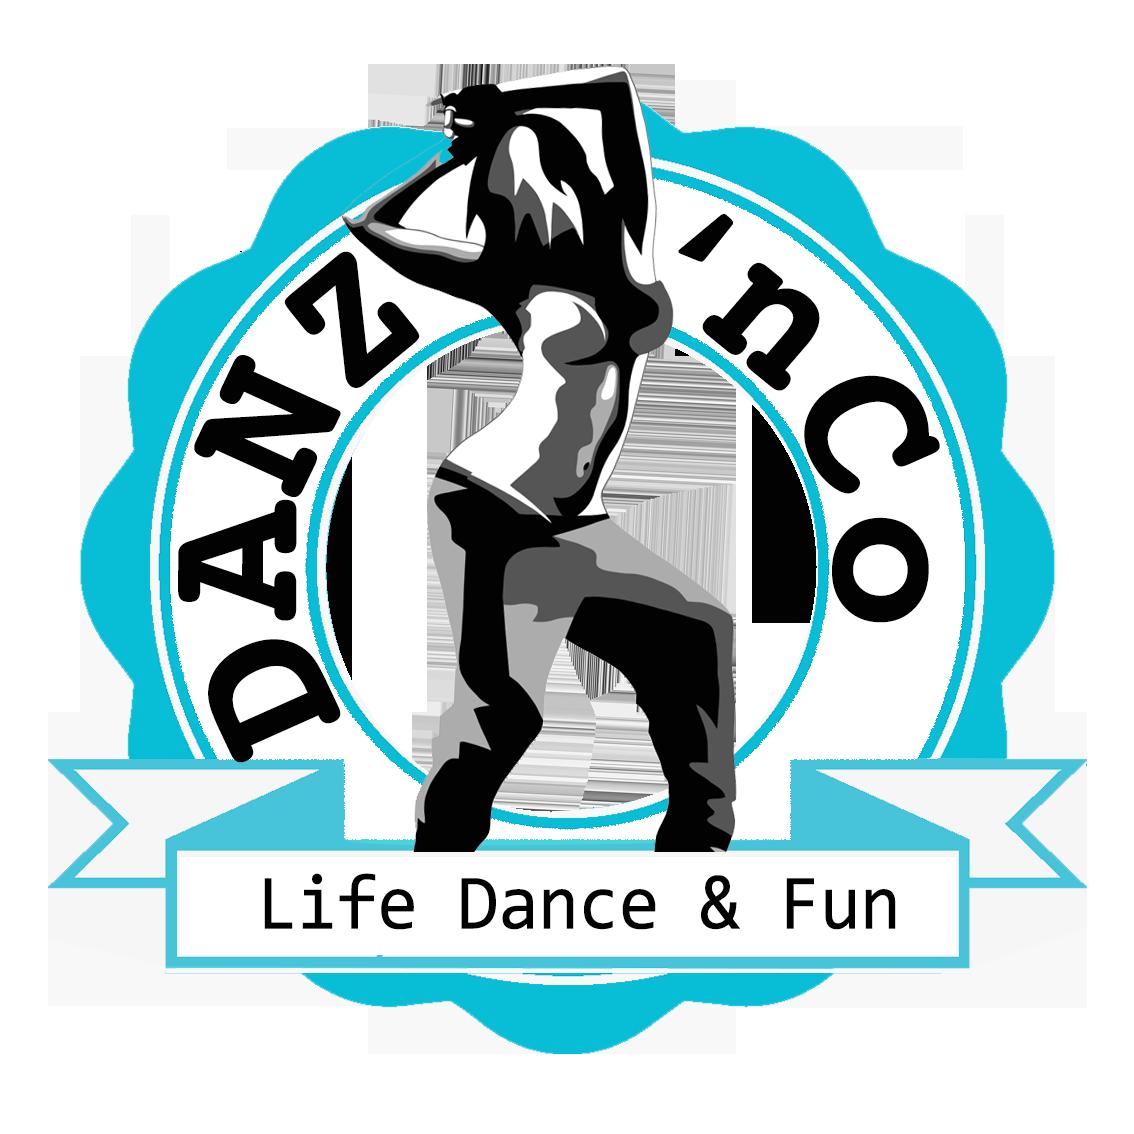 Ecole de danse Montpellier Salsa bachata kizomba zumba latin fusion